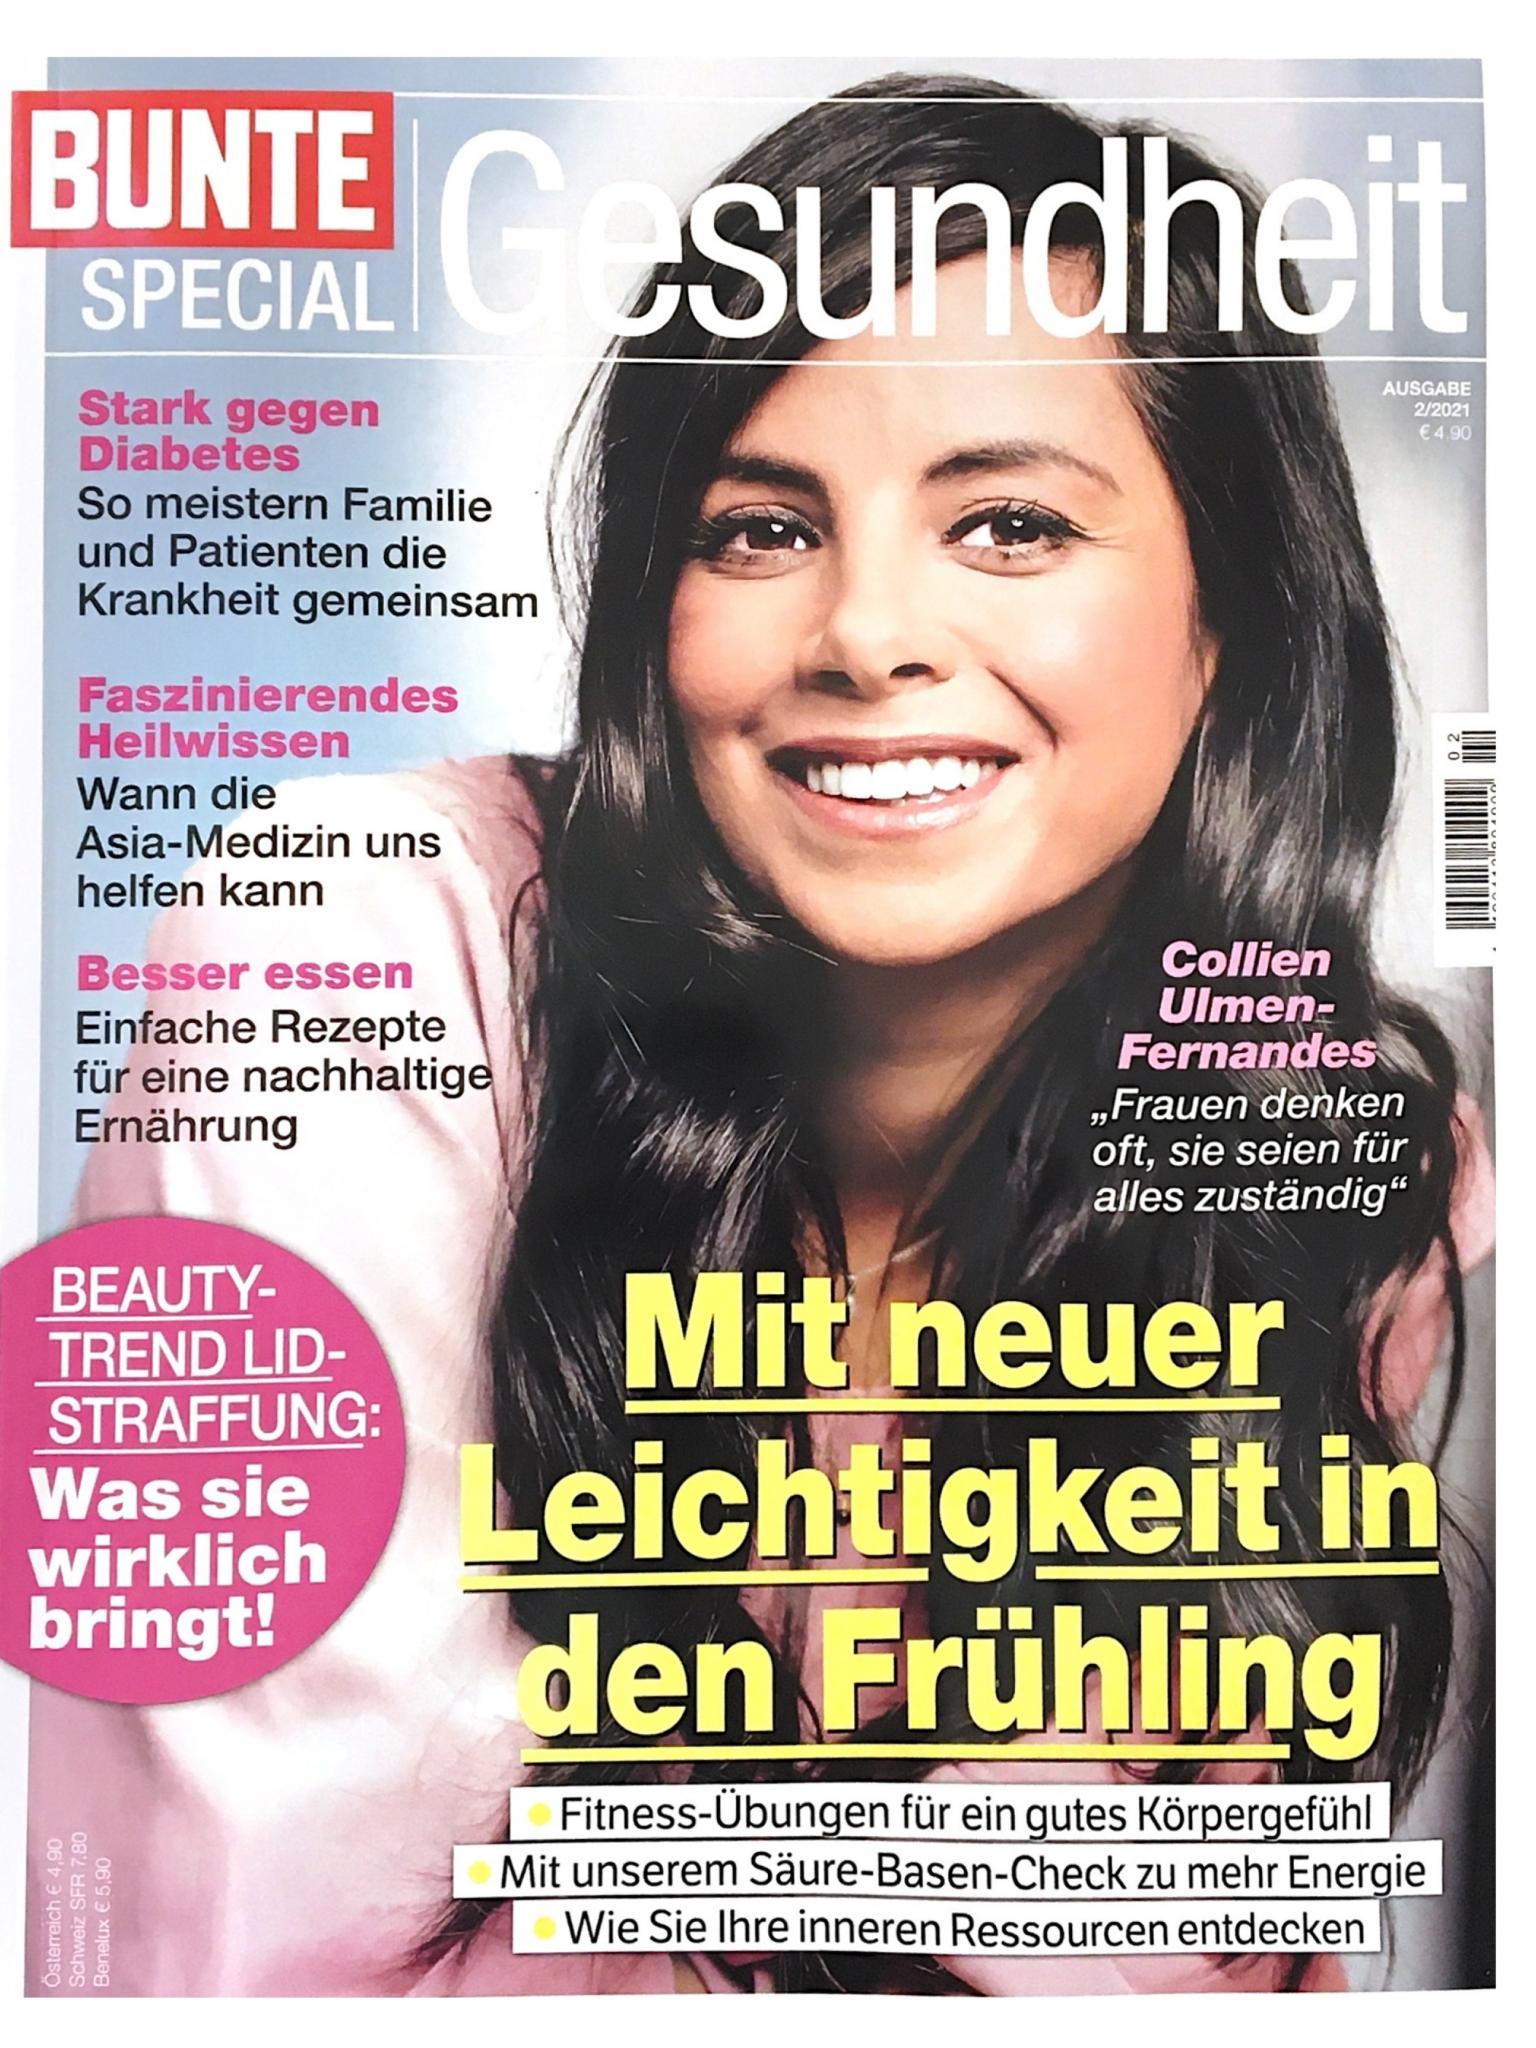 Bunte Gesundheit Cover 2/2021